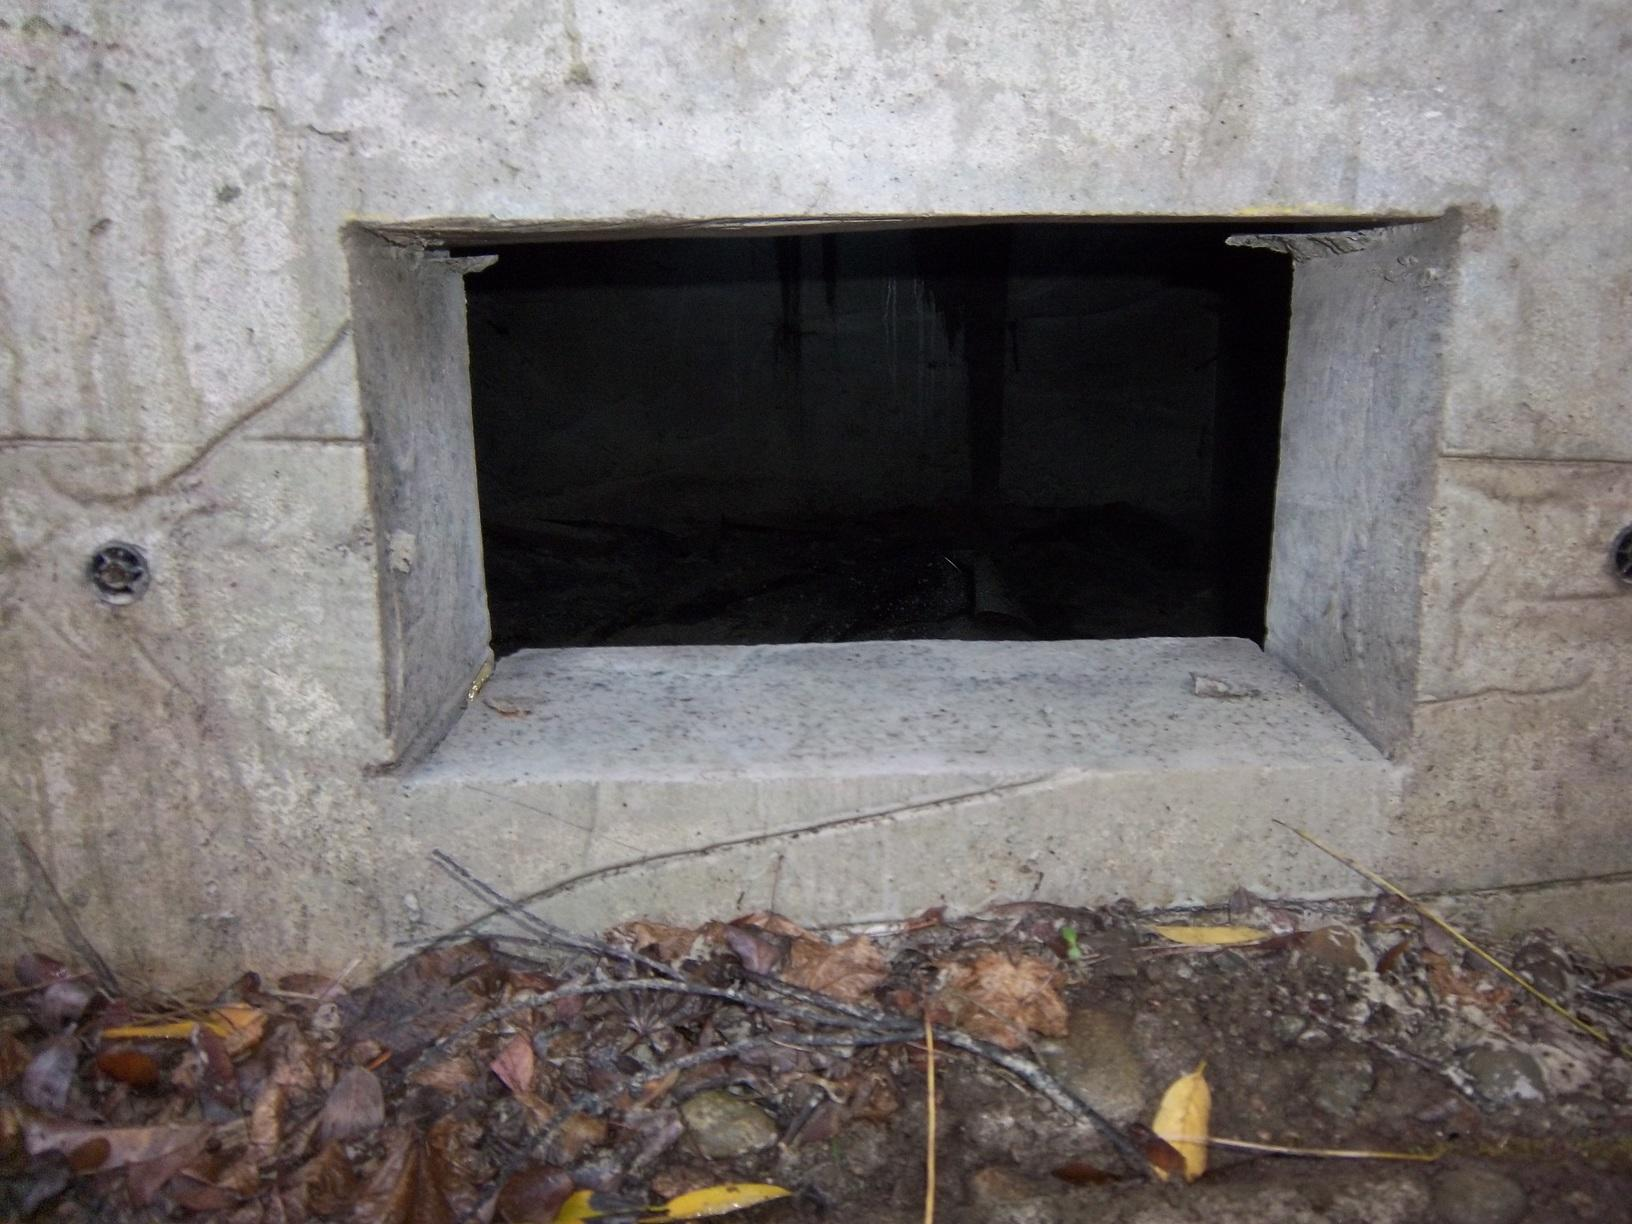 Crawl Space Vent Cover in Bucoda, Washington - Before Photo